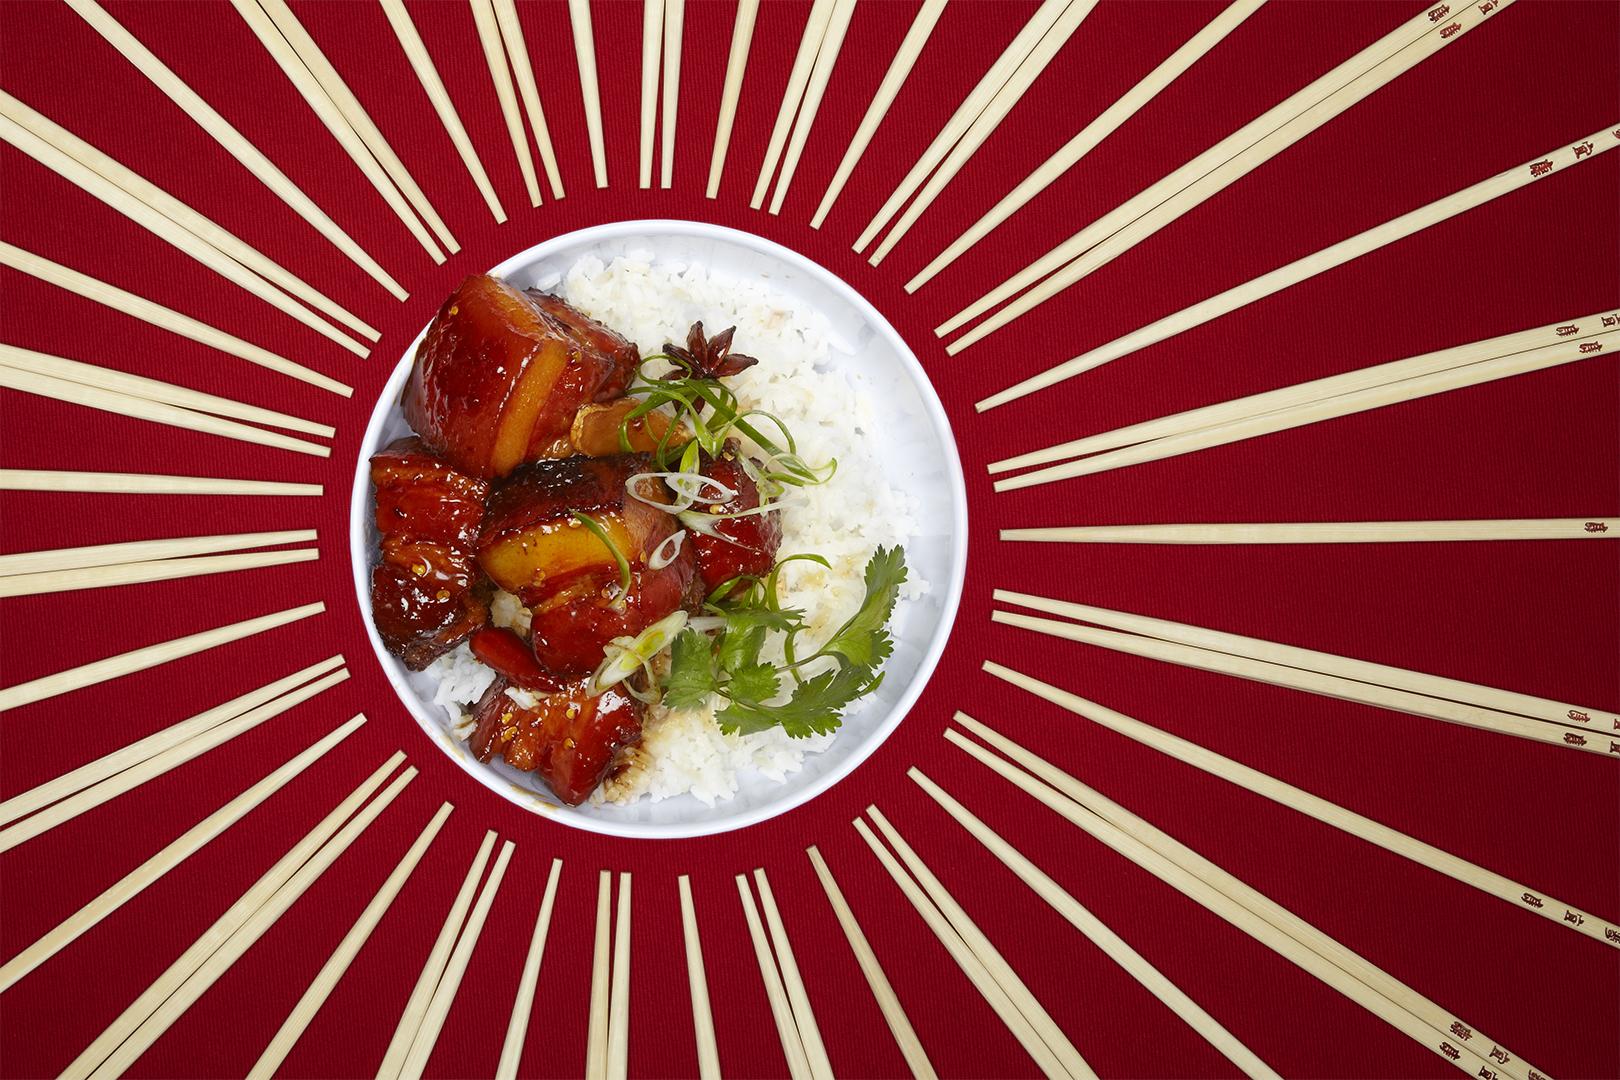 Final Chopstick Image Croped